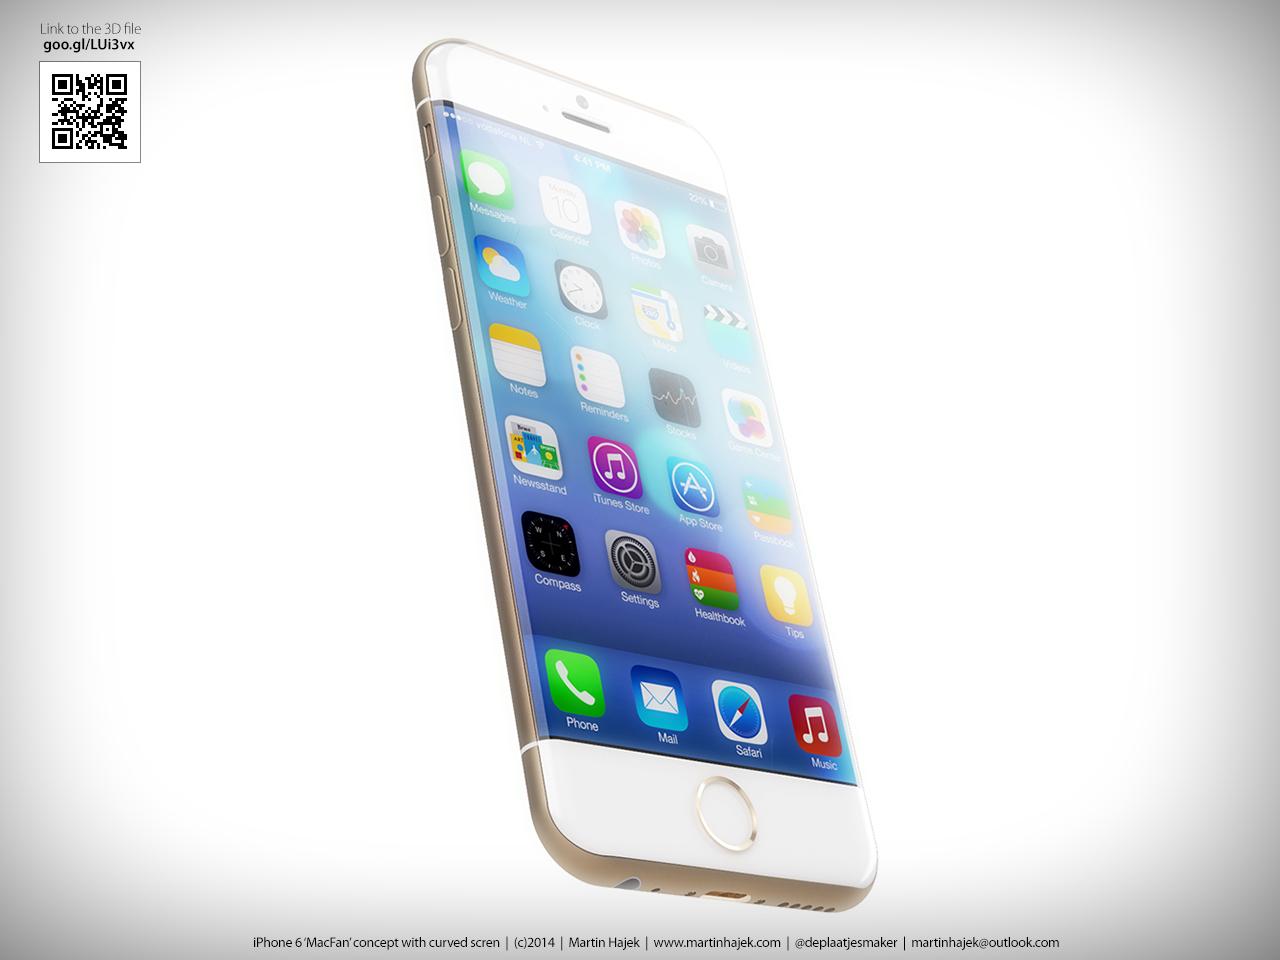 iPhone-6 news